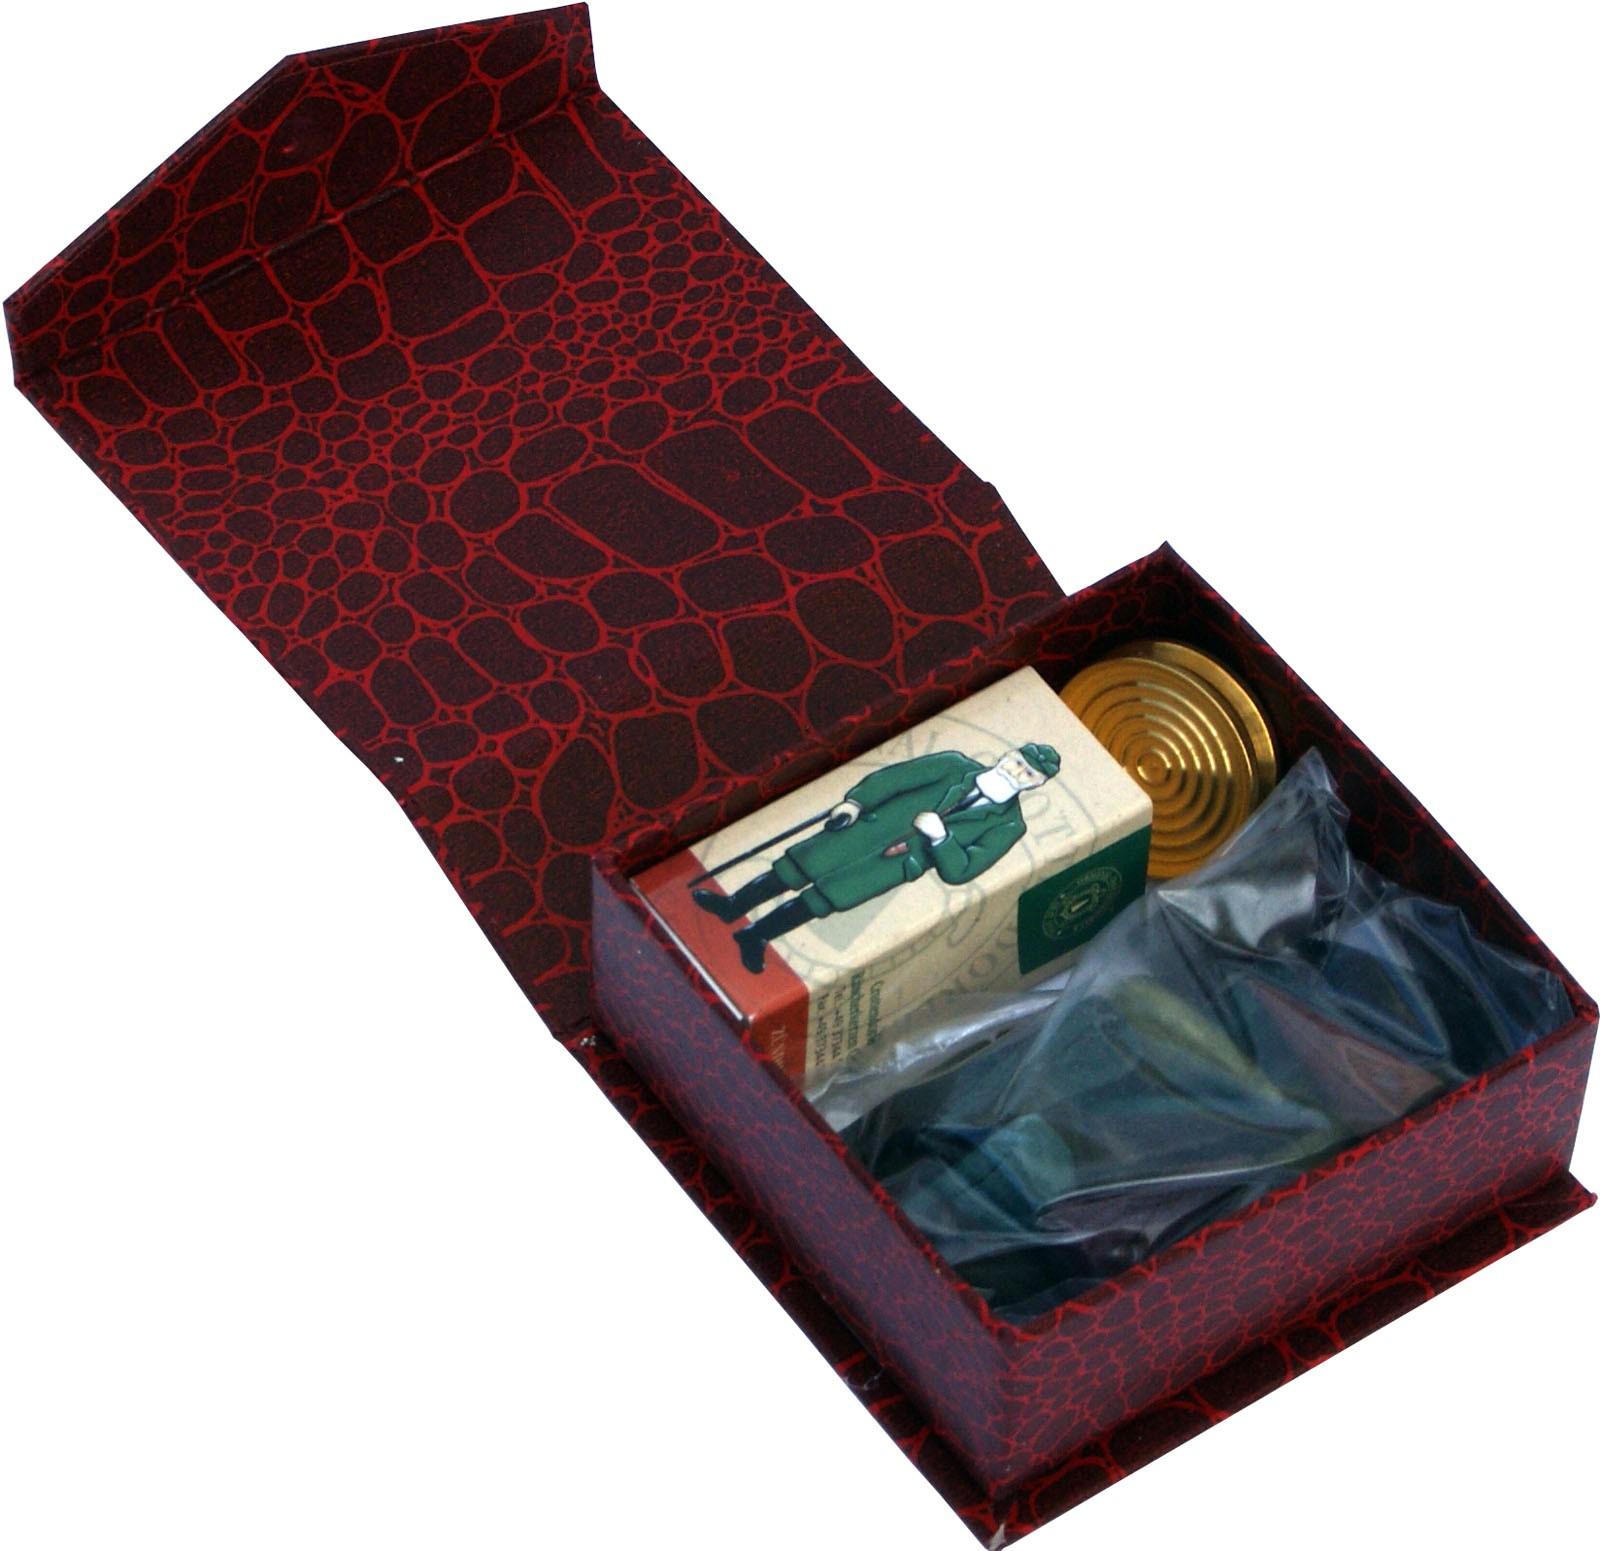 Crottendorfer Geschenkbox Wunschduft mit Messingschale